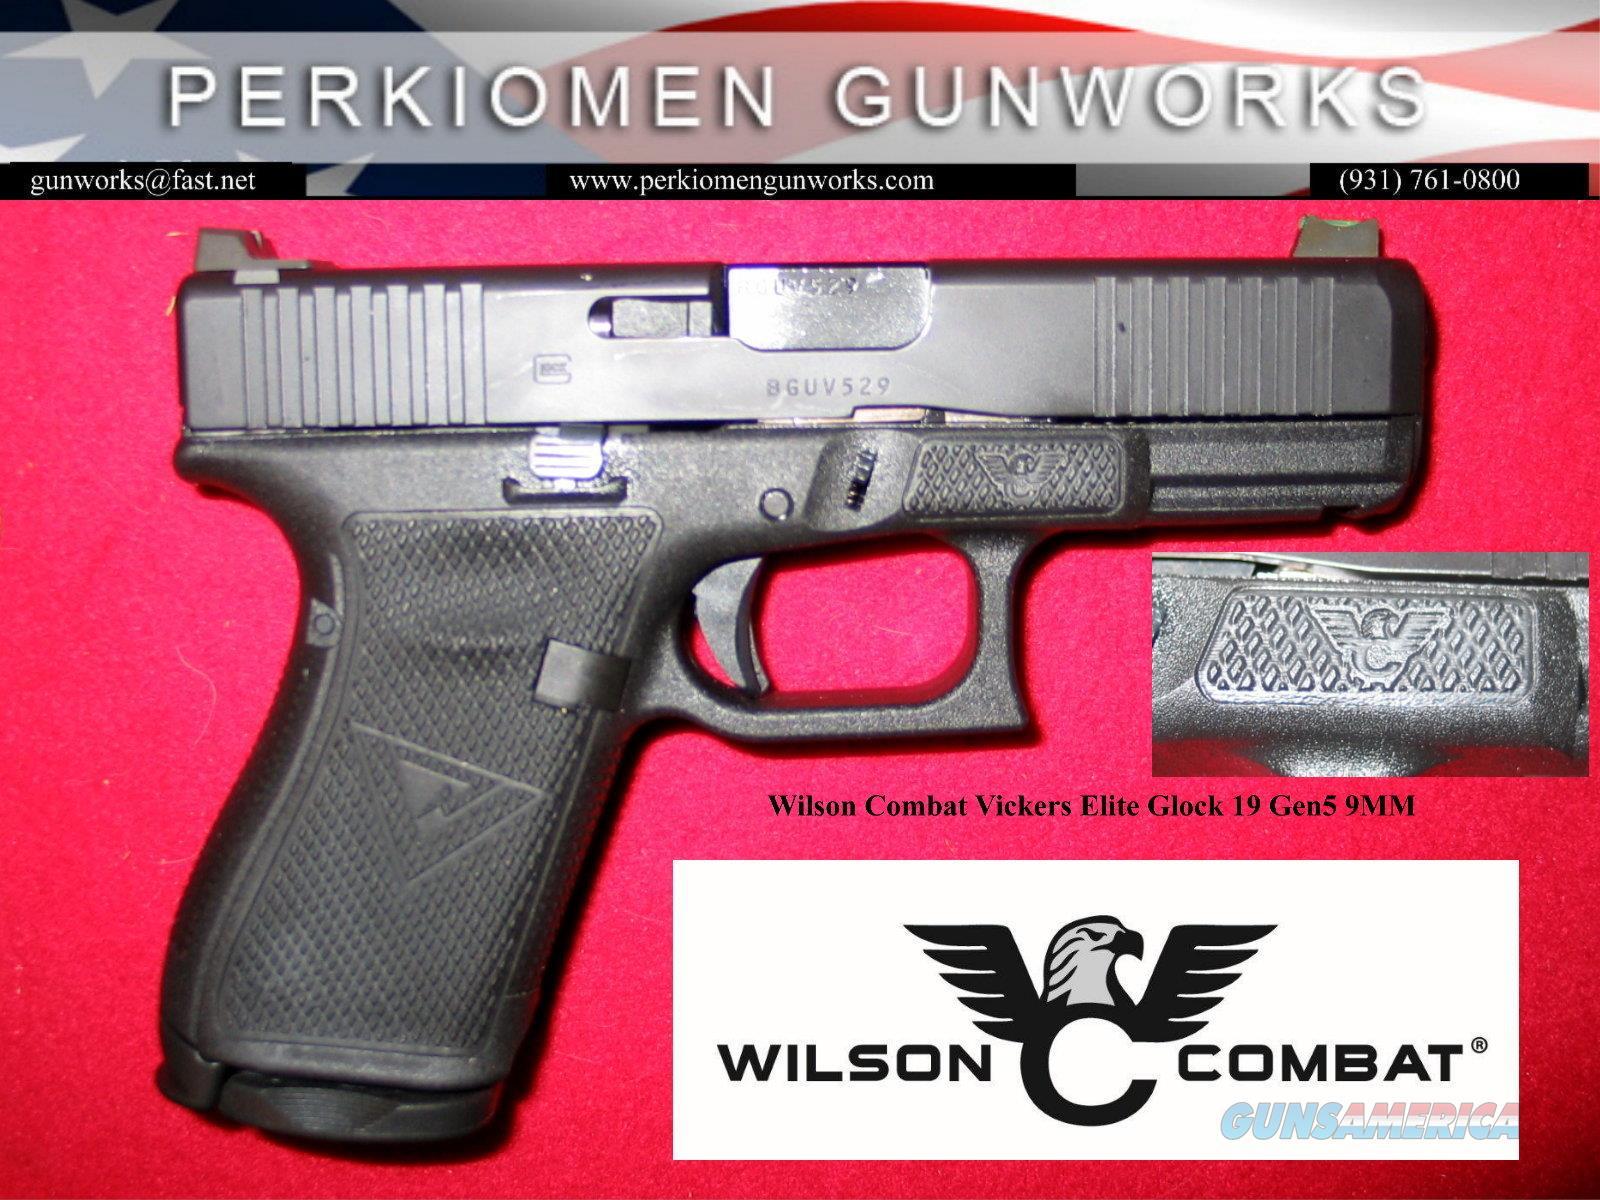 Wilson Combat - Vickers Elite GLOCK 19, Gen 5, 9mm, NIB  Guns > Pistols > Glock Pistols > 19/19X